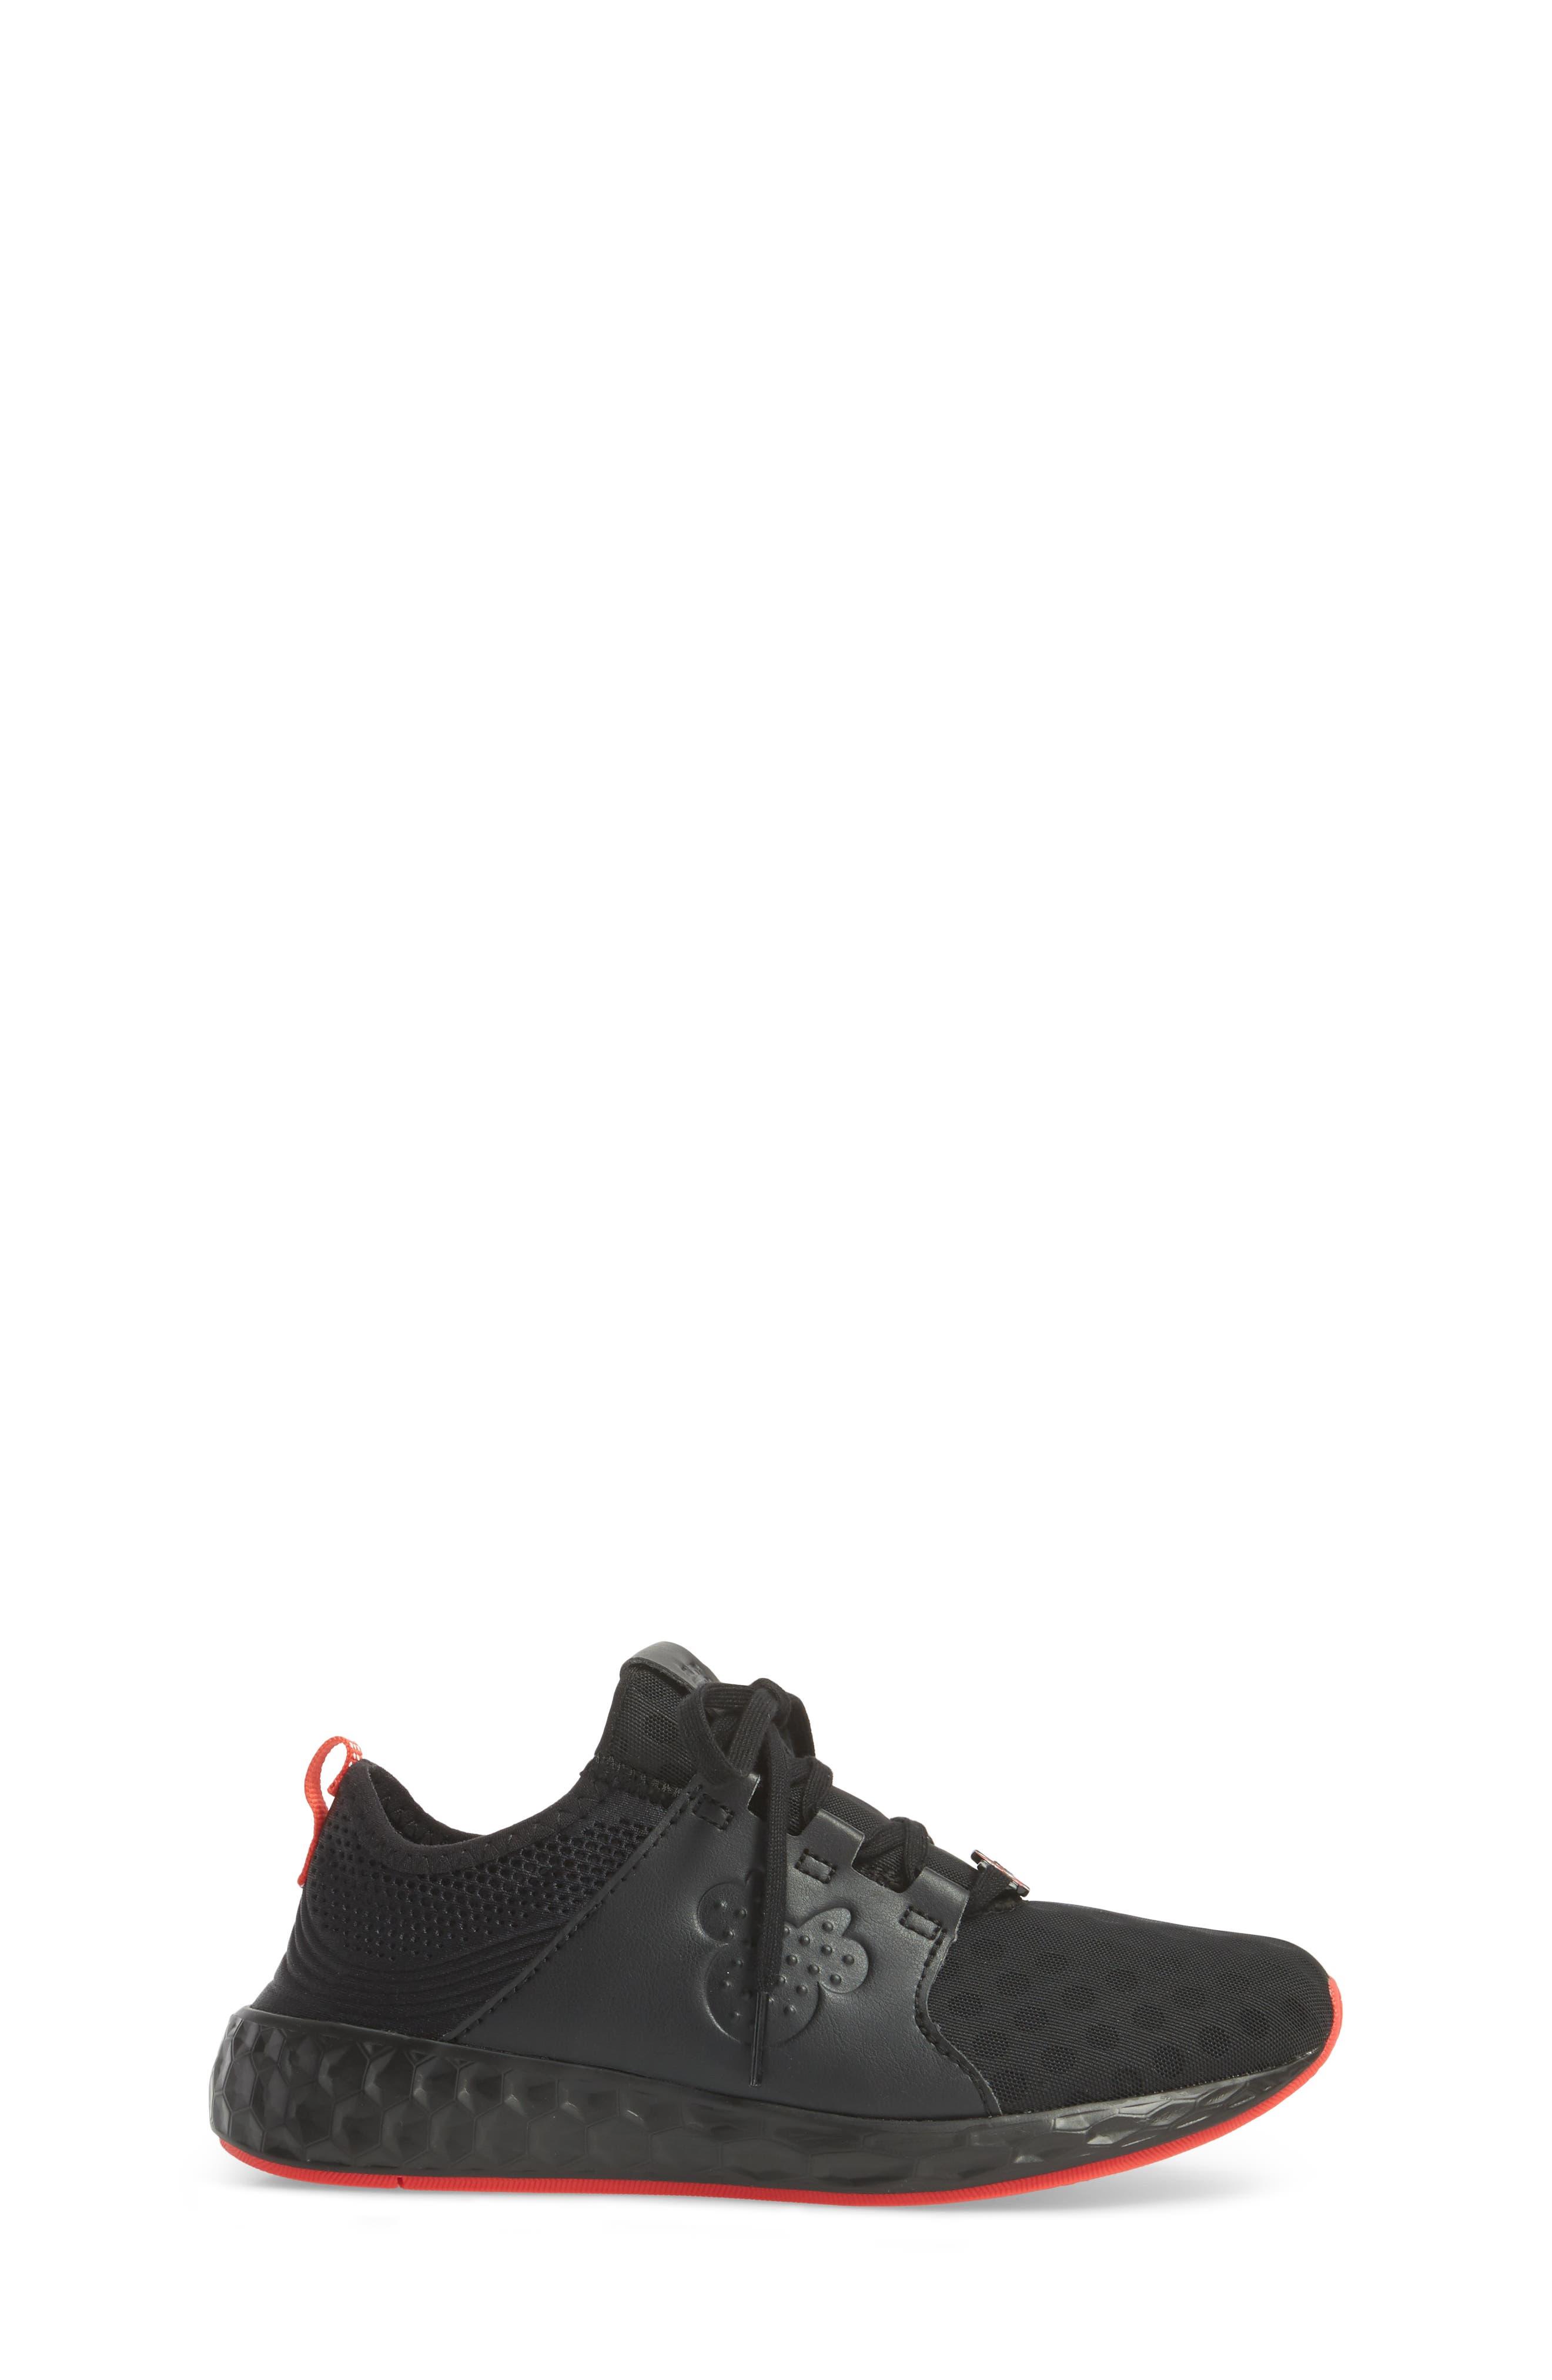 x Disney Minnie Mouse Cruz Sport Sneaker,                             Alternate thumbnail 3, color,                             Black/ Red